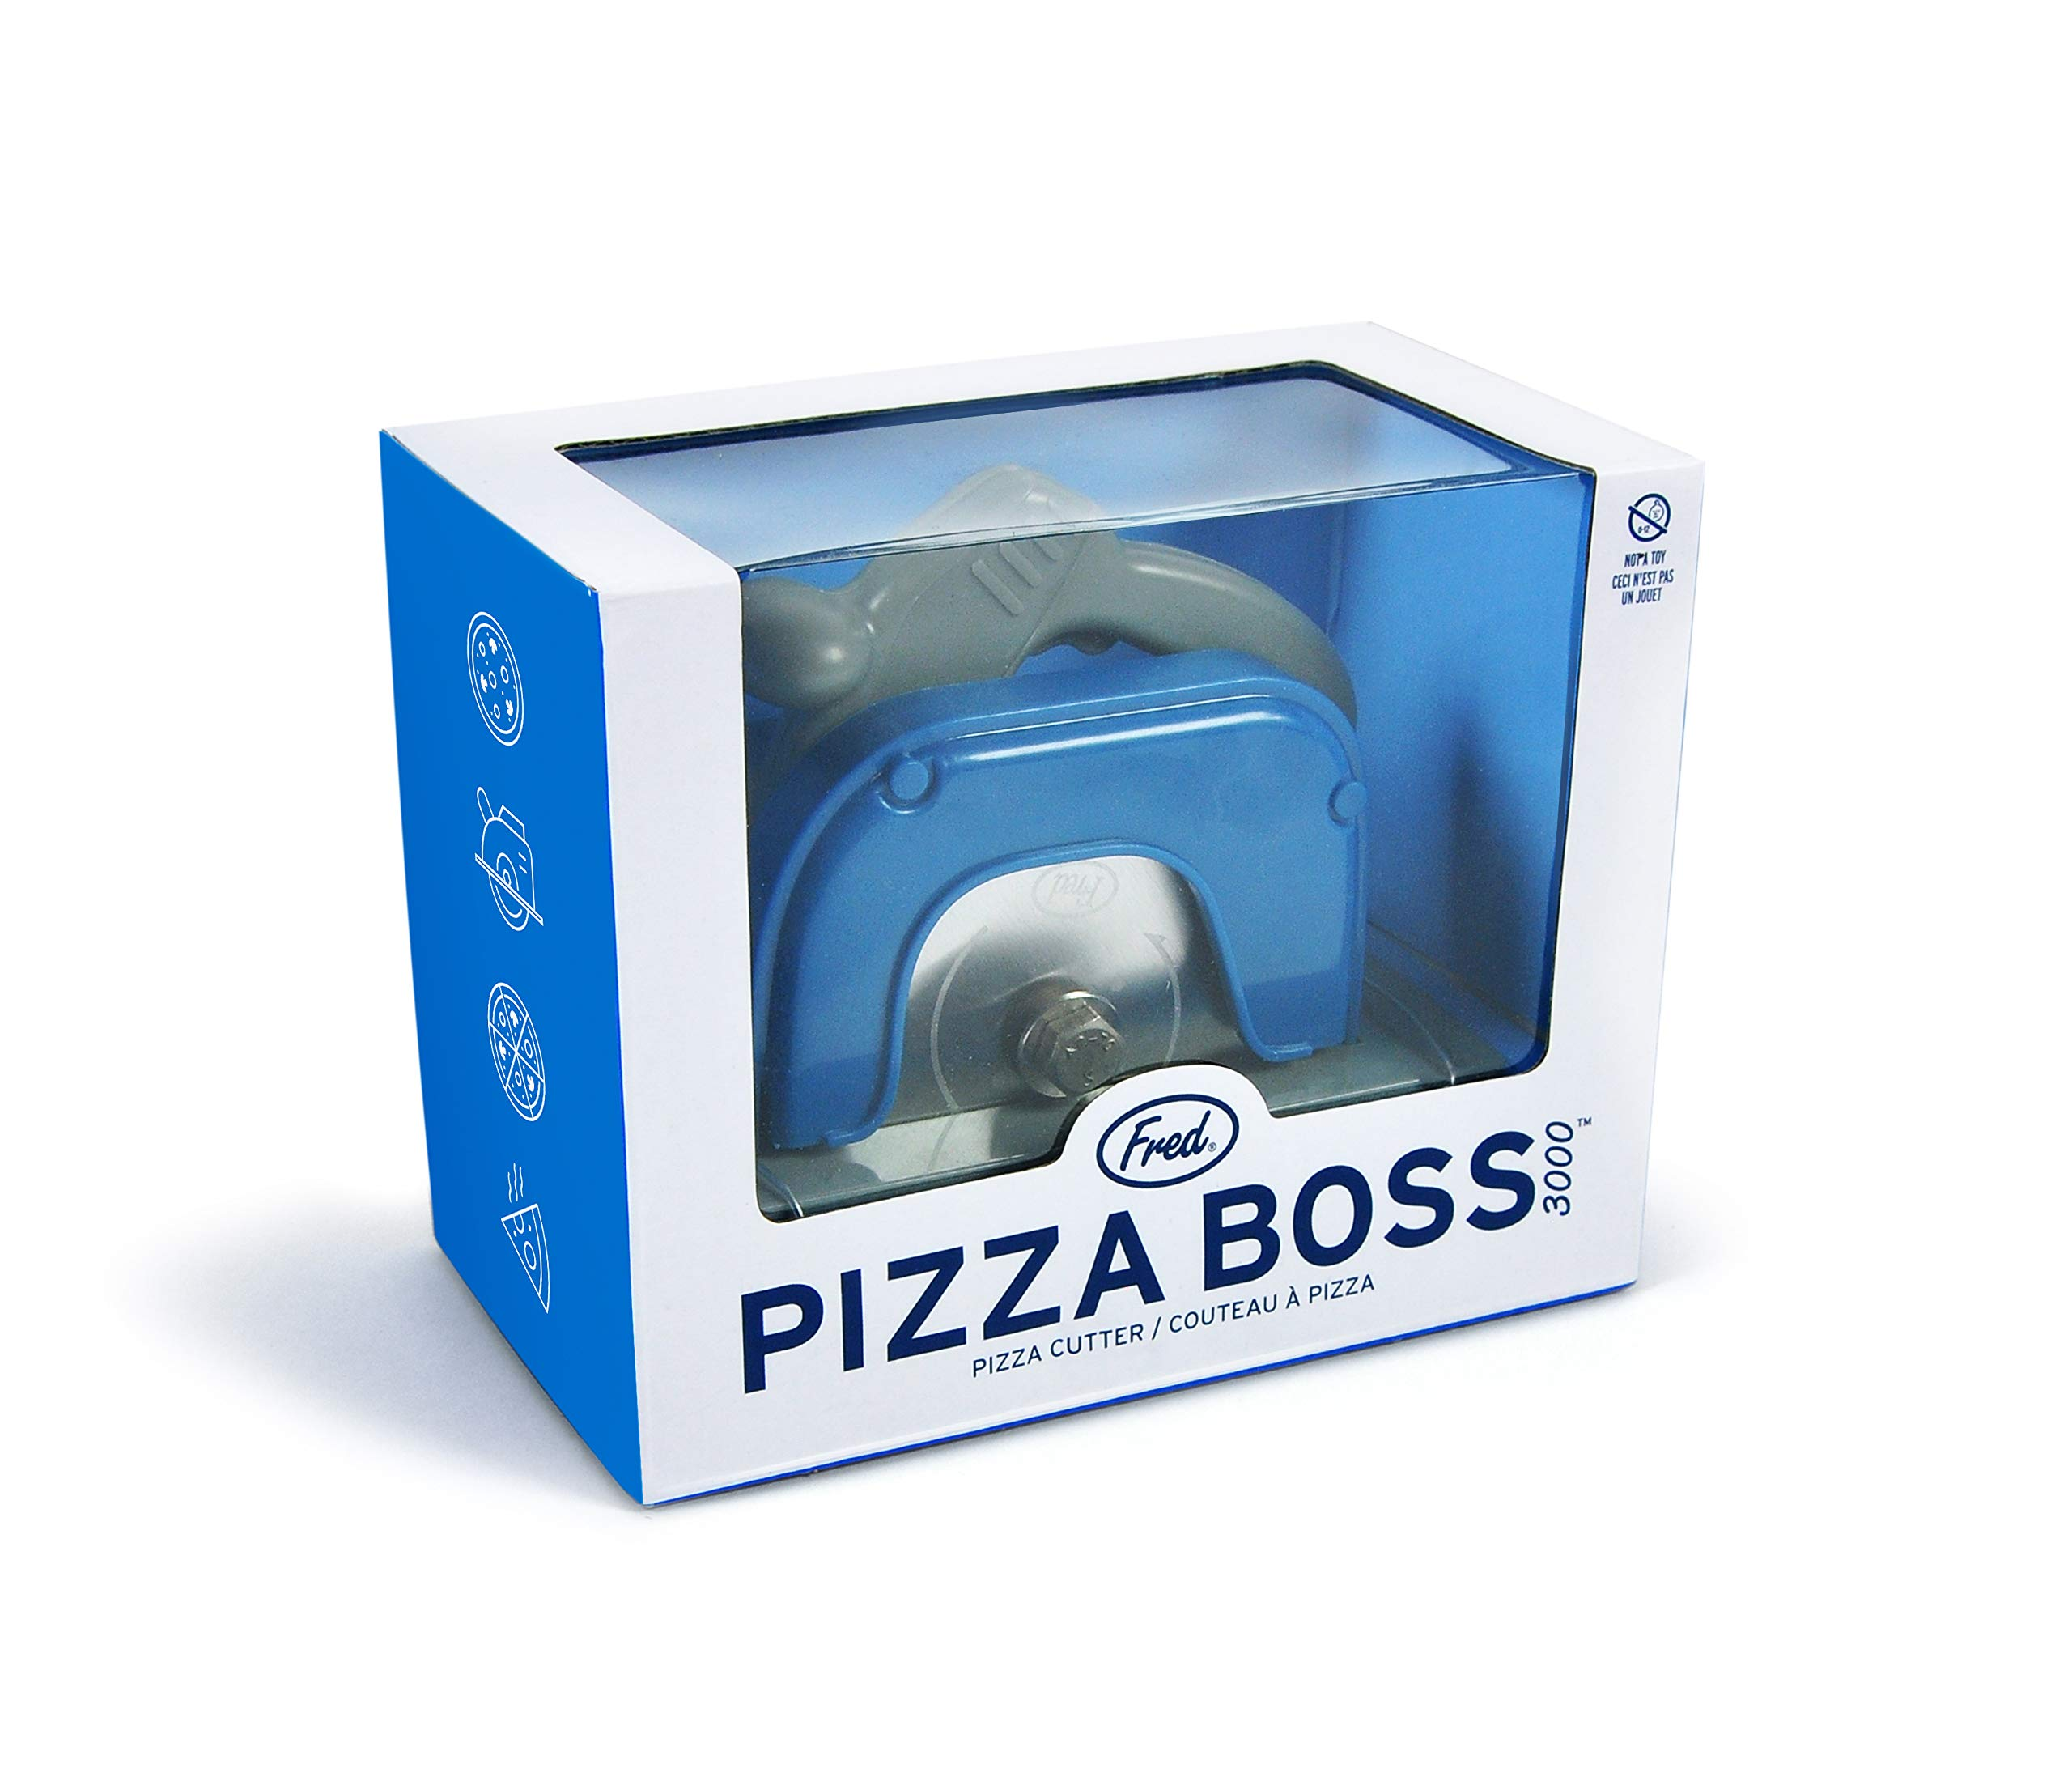 Ergonomic Soft TPR Grip 10.3Inch Asdirne Pizza Scissors Black/&Red Ultra Sharp Detachable Blade with a Tray Pizza Cutter